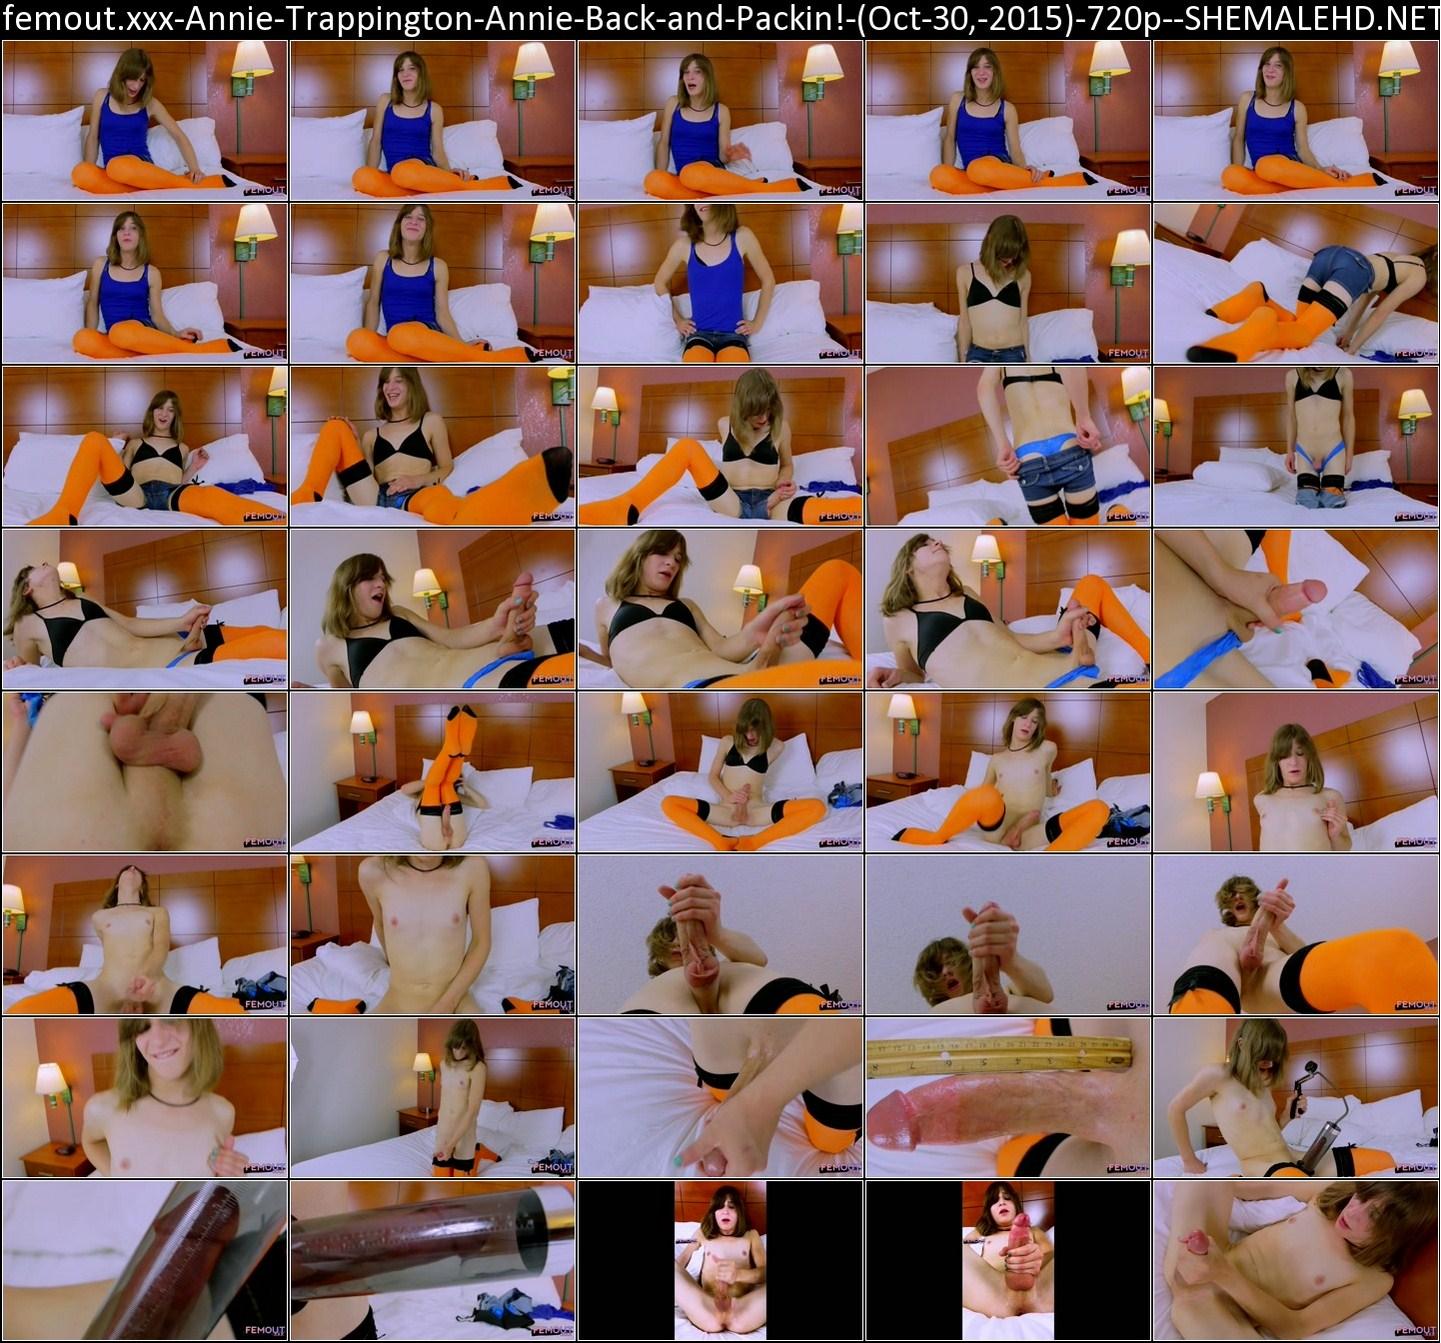 femout.xxx-Annie-Trappington-Annie-Back-and-Packin_-_Oct-30_-2015_-720p--SHEMALEHD.NET.jpg